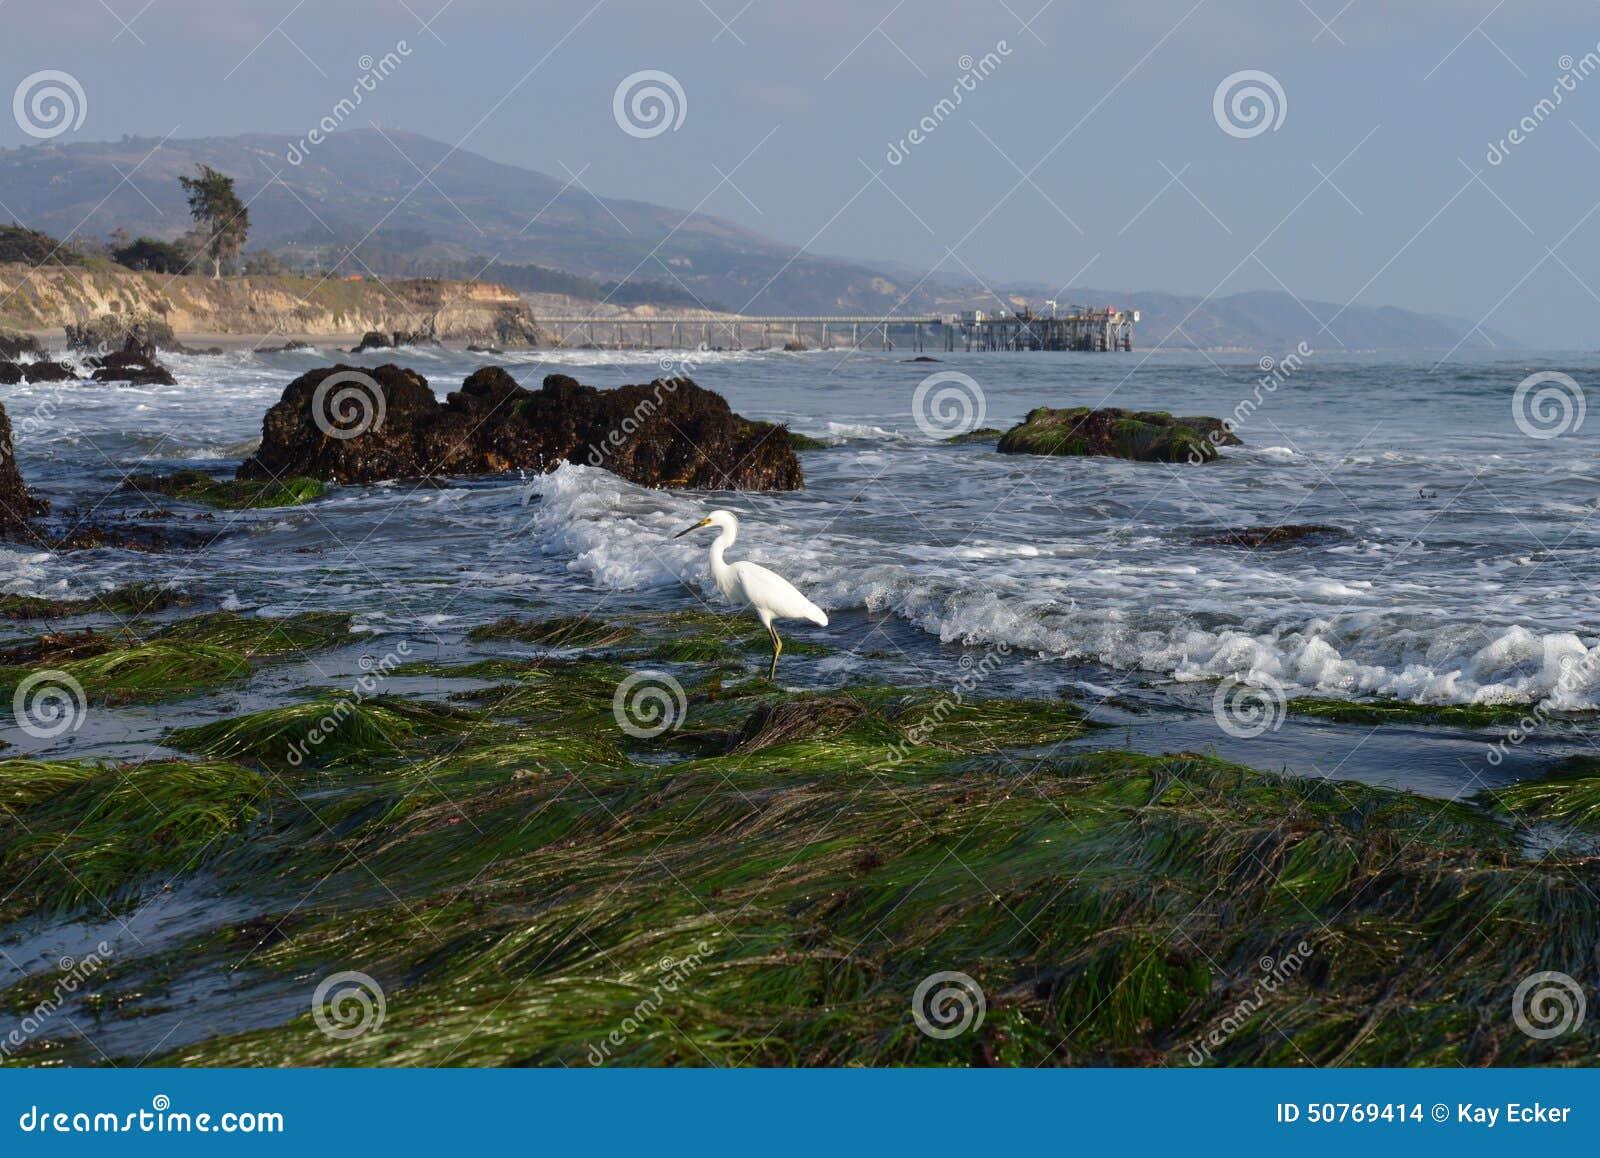 White Heron at Beach